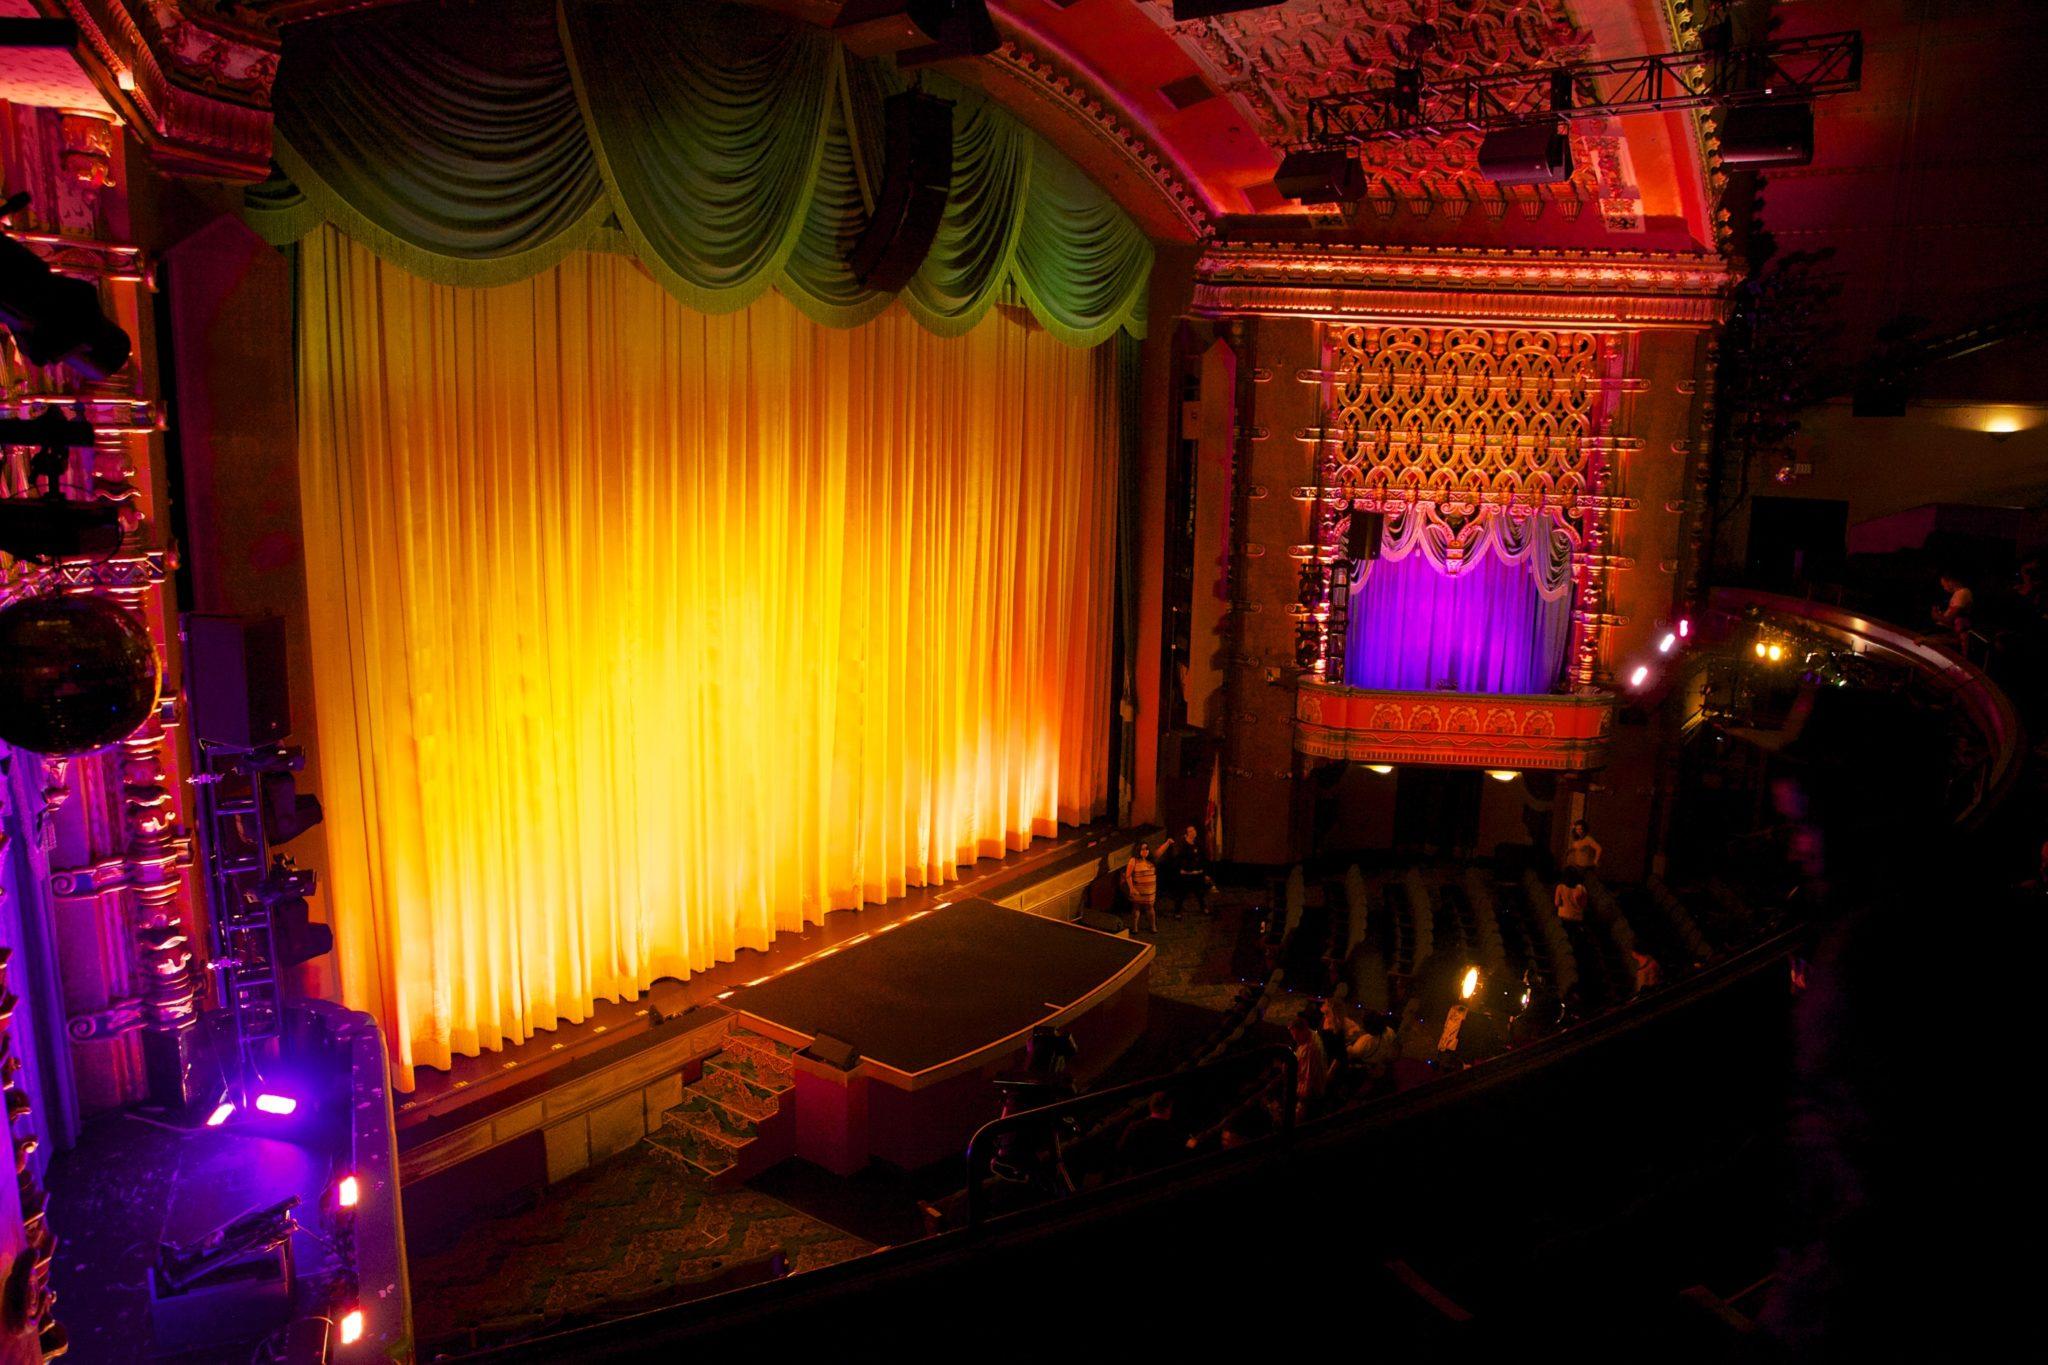 The El Capitan Movie Theater